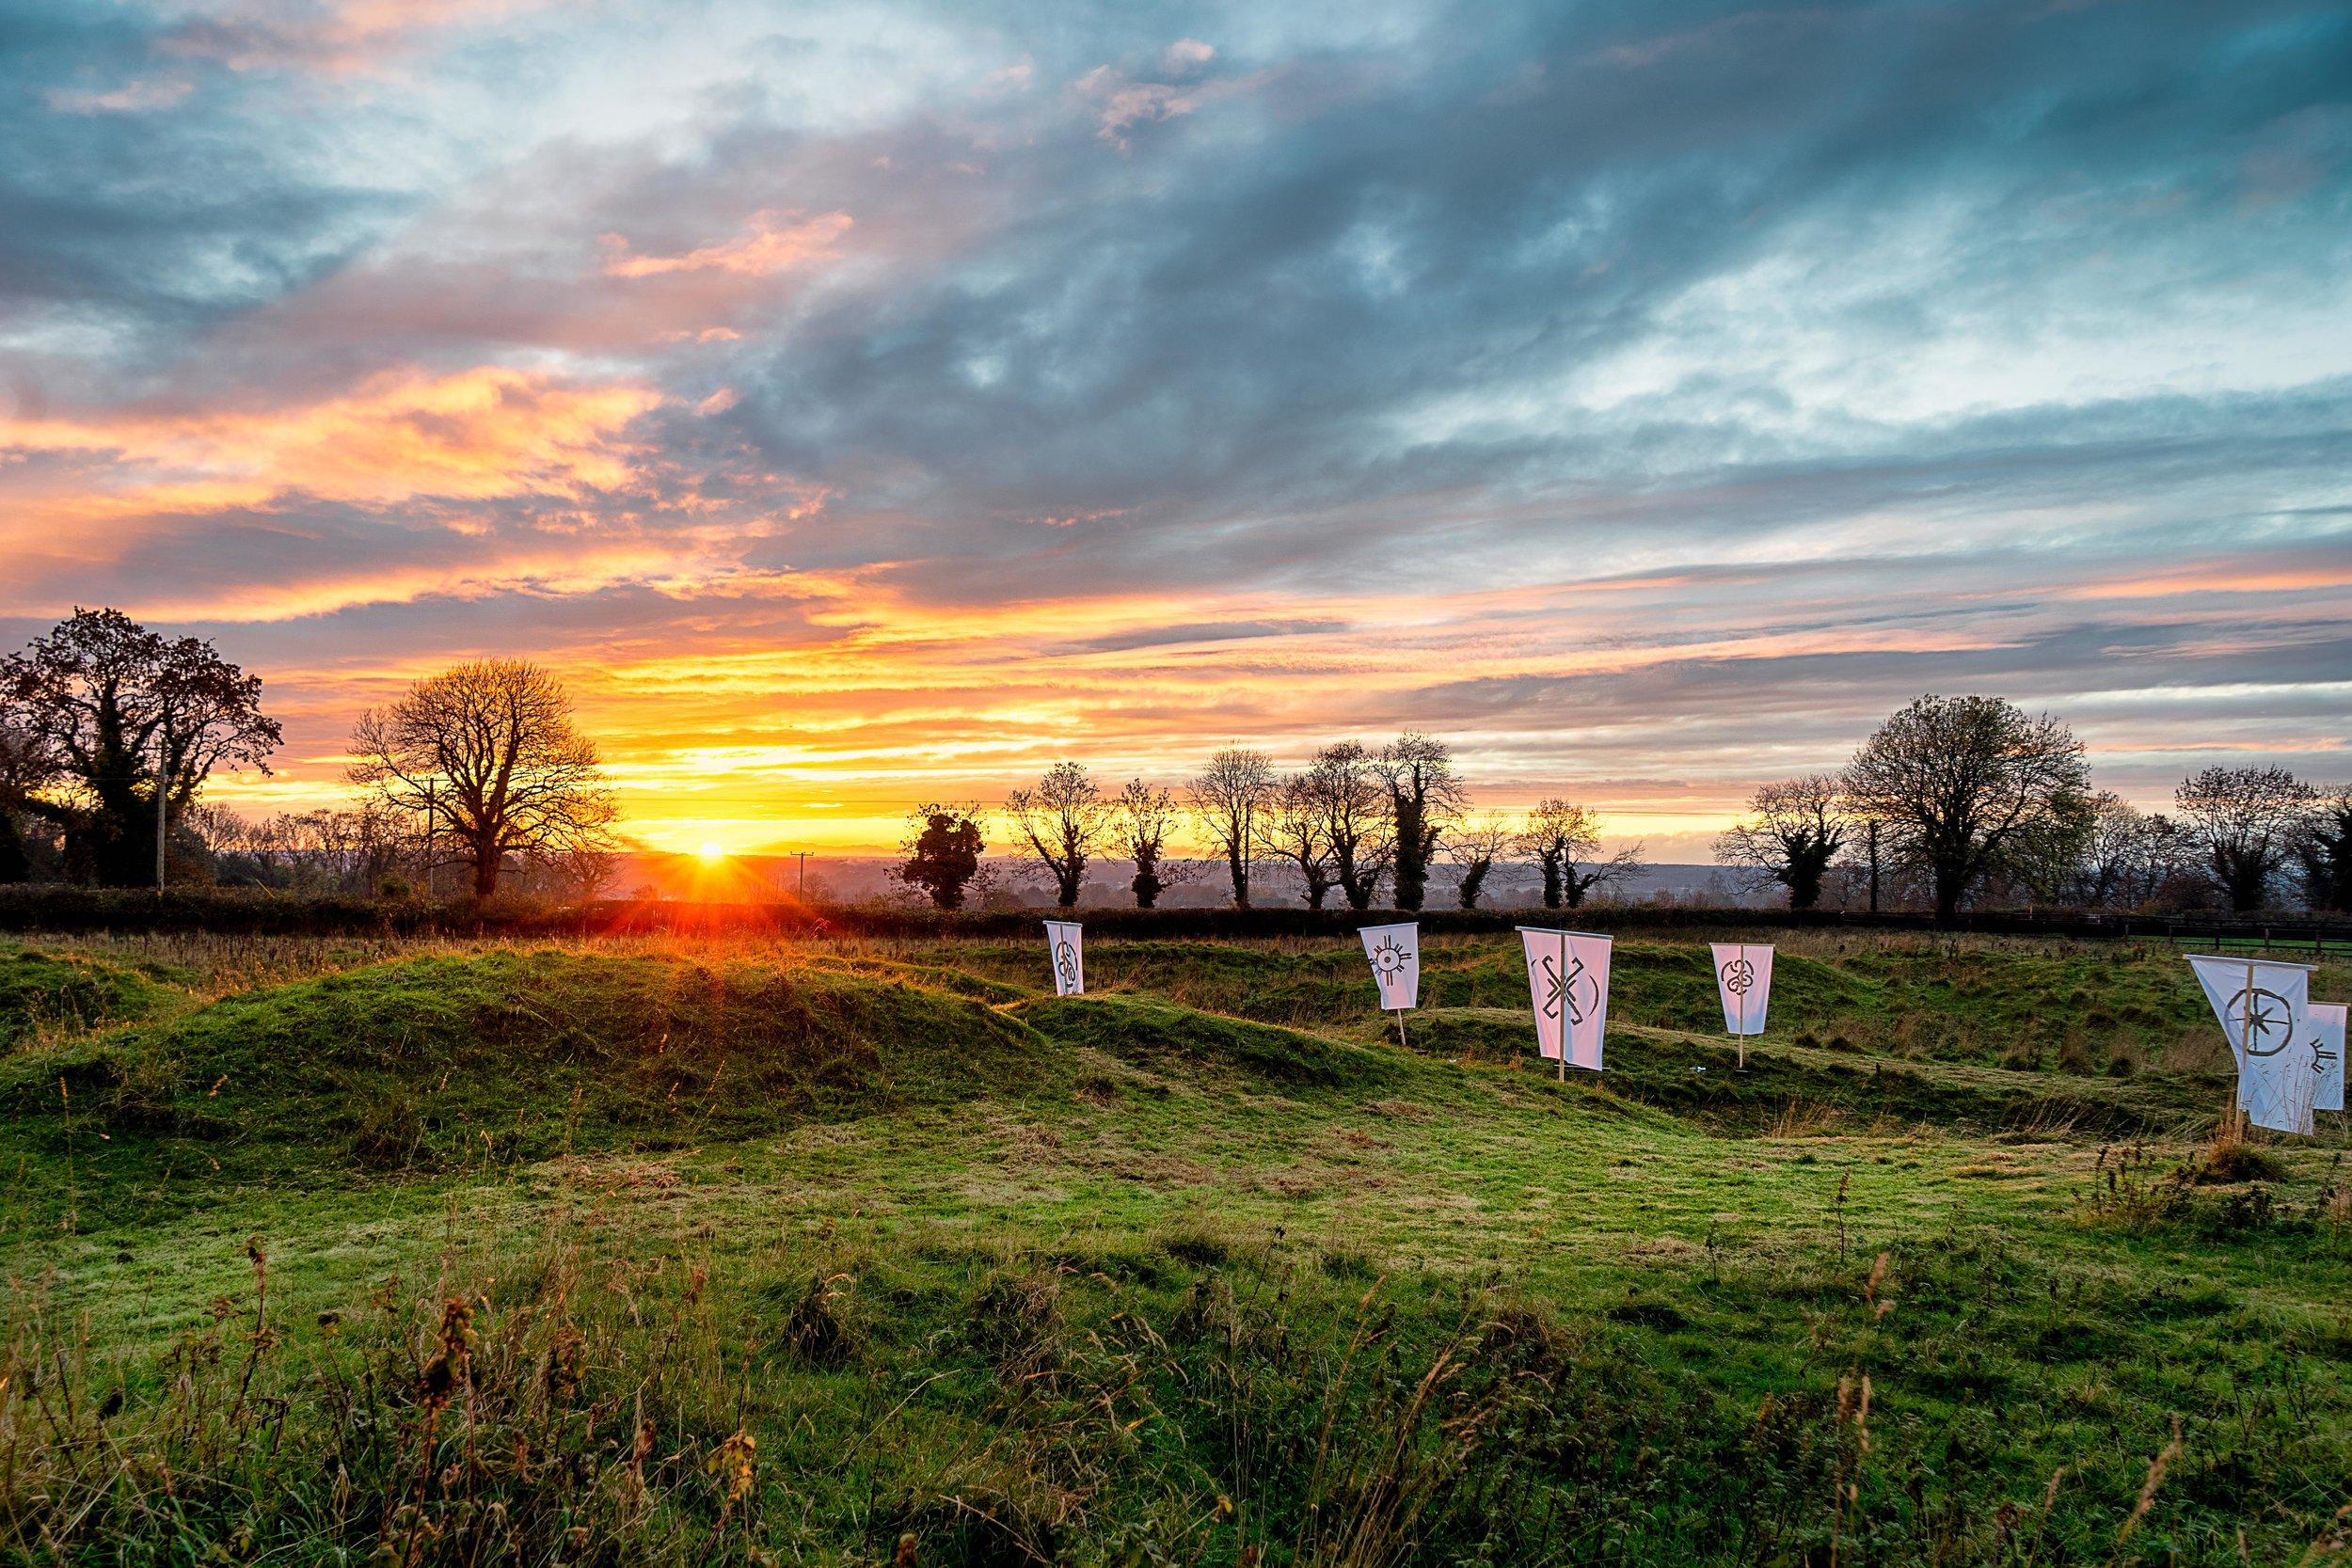 Tlachtga. hill of ward. ireland. irish. history. halloween. druid. epic sunset..jpg